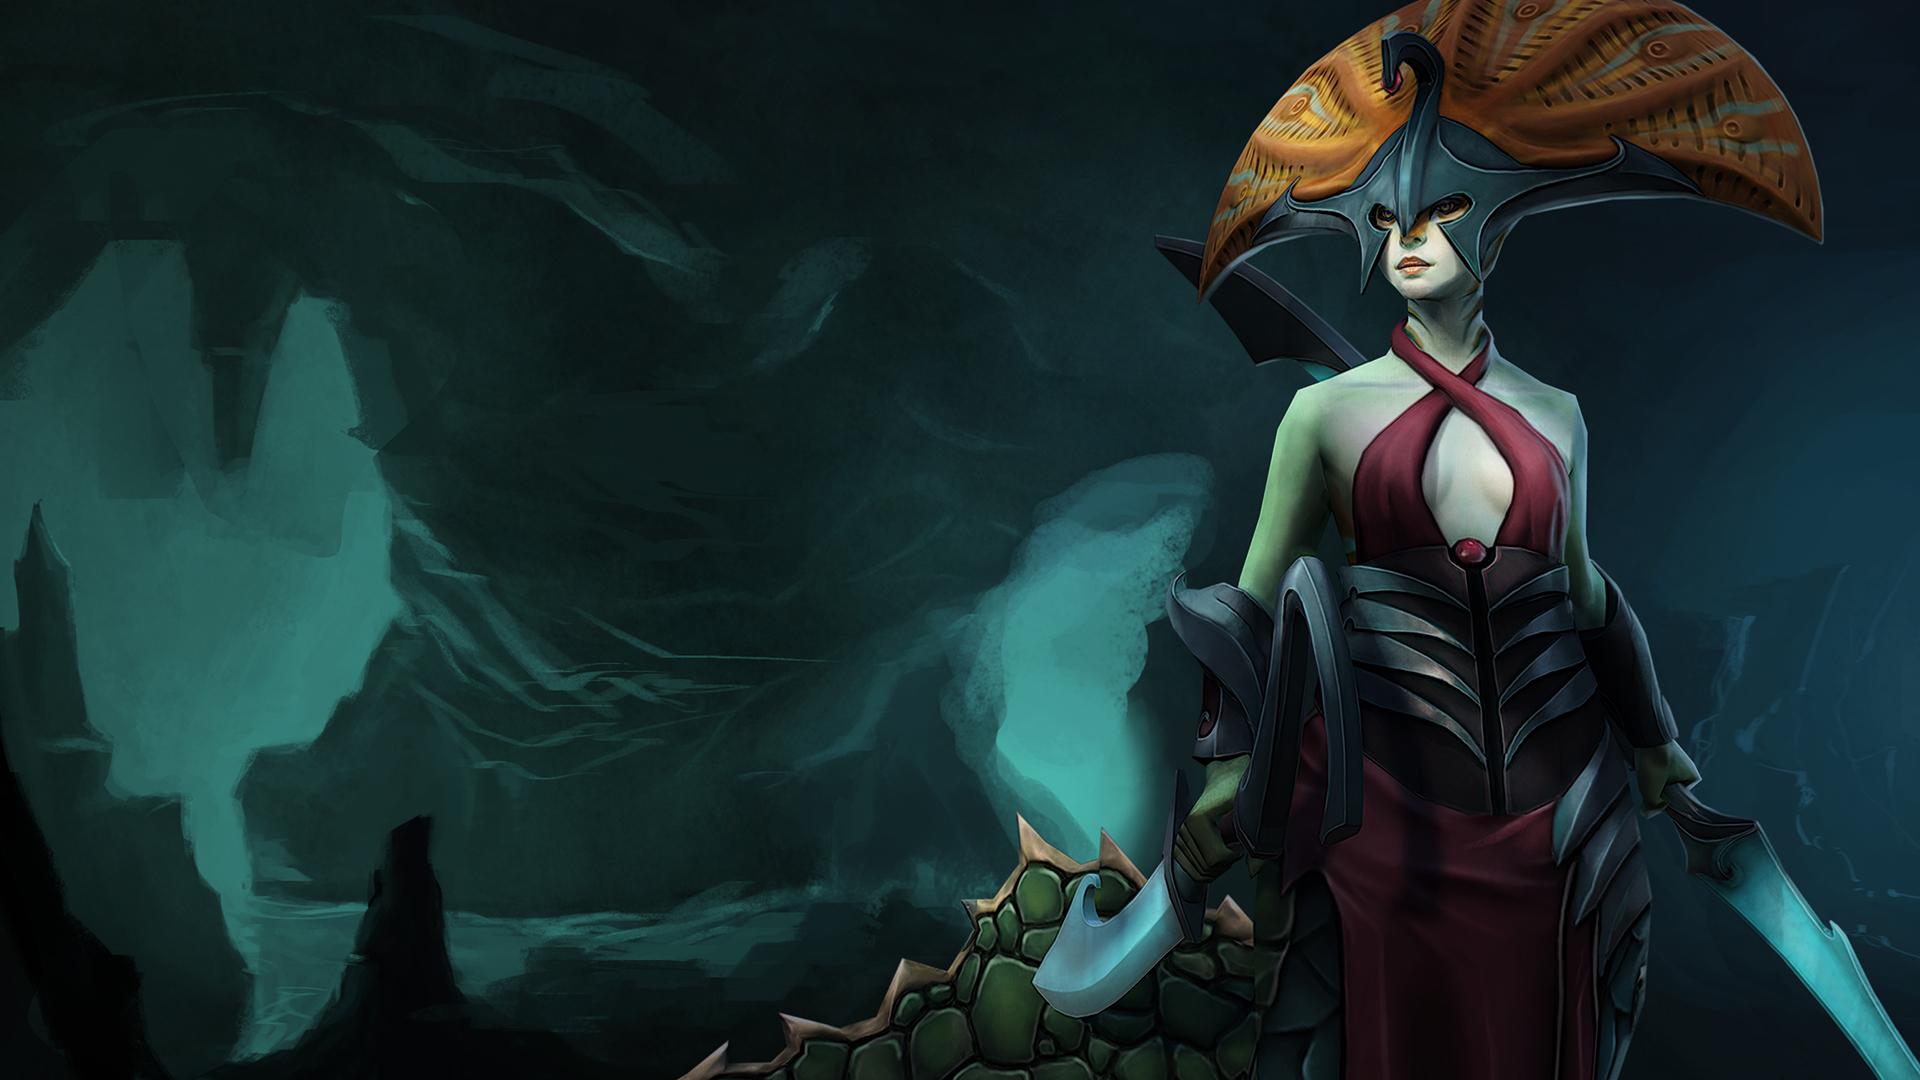 Dota 2 Naga Siren Set 7u Wallpaper HD